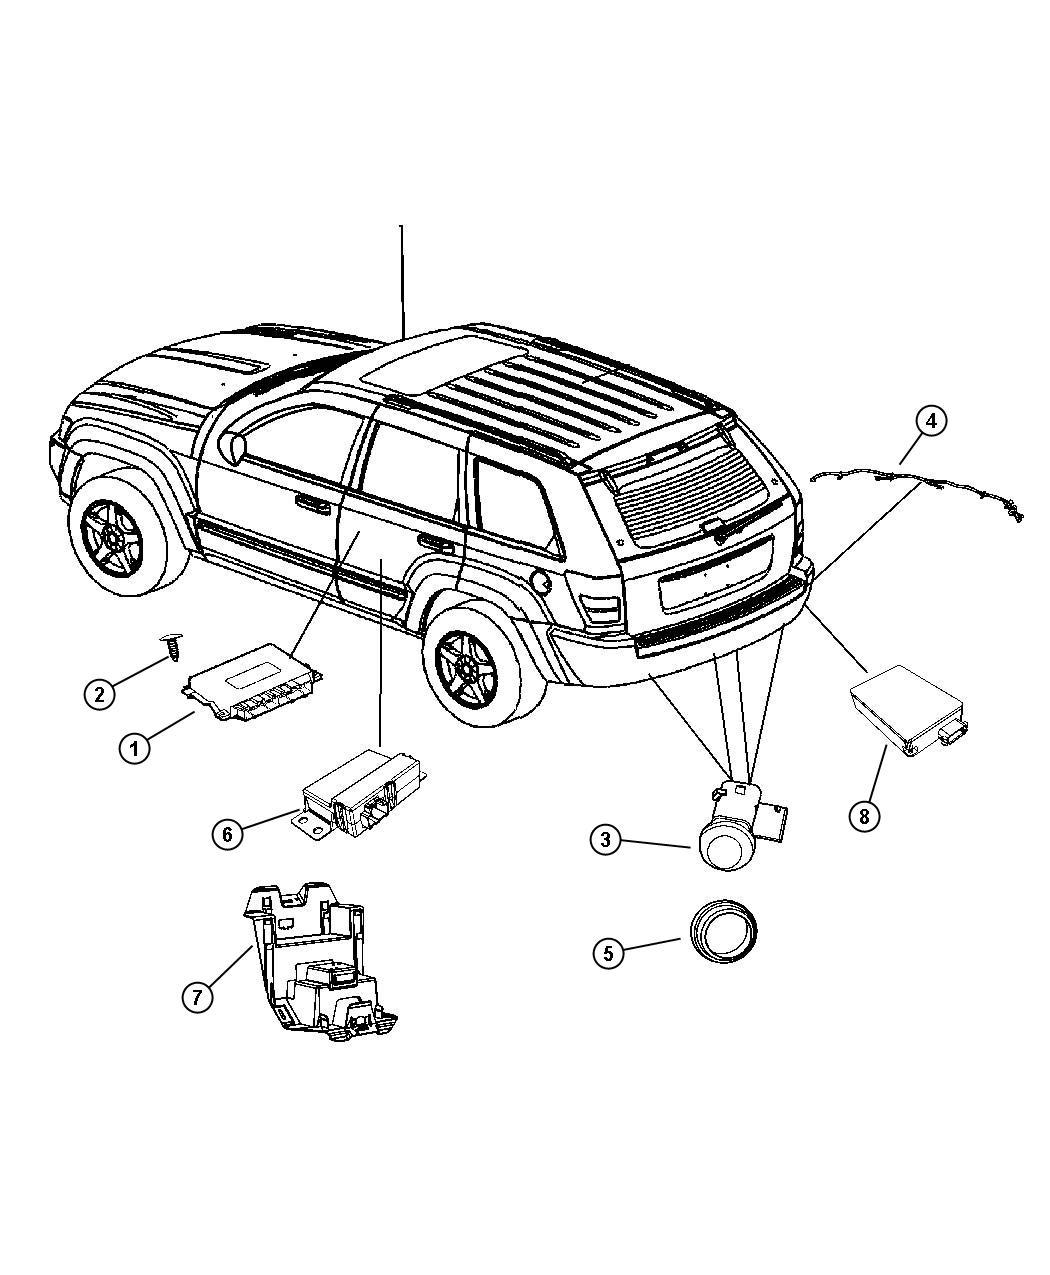 Jeep Grand Cherokee Headlight Wiring Harness